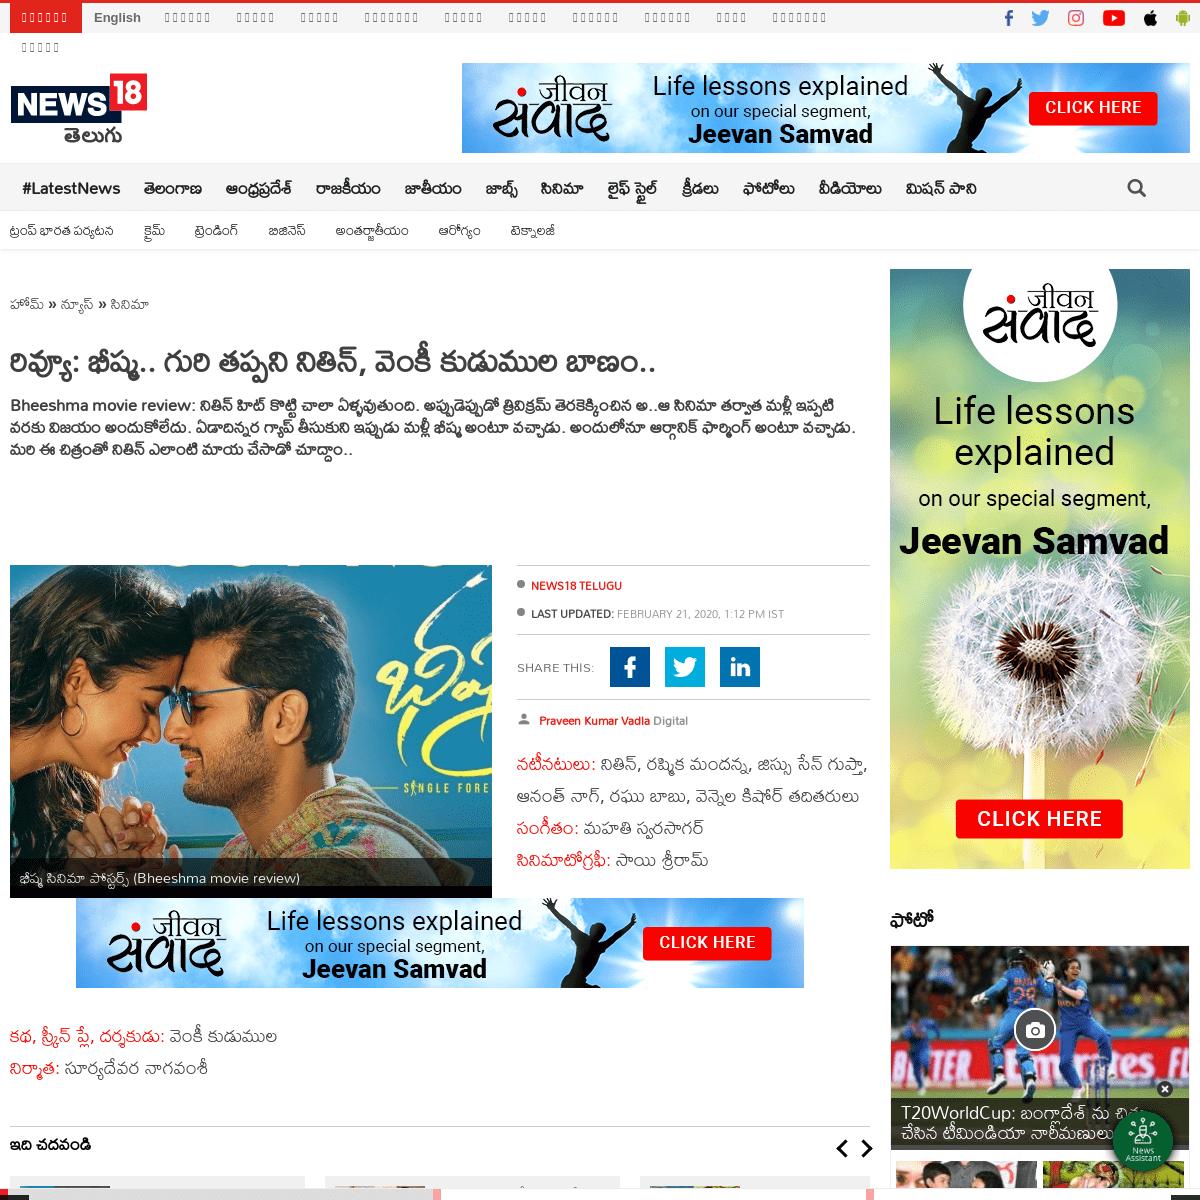 ArchiveBay.com - telugu.news18.com/news/movies/bheeshma-movie-review-and-nithiin-venky-kudumula-comes-up-with-a-perfect-entertainer-with-massage-pk-458872.html - రివ్యూ- భీష్మ.. గురి తప్పని నితిన్, వెంకీ కుడుముల